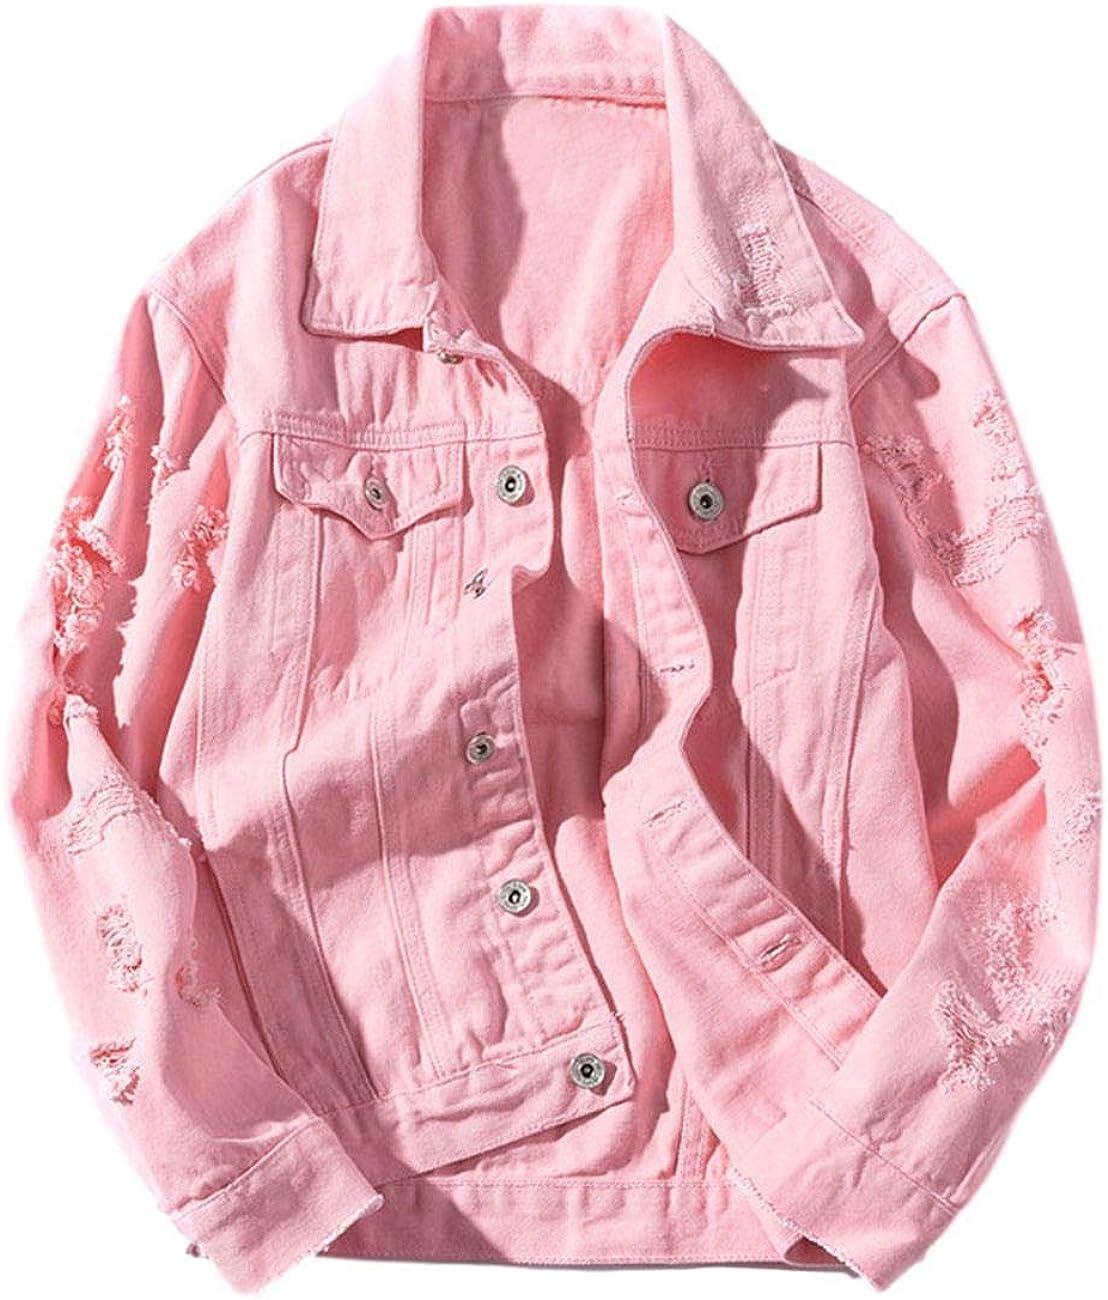 ZLSLZ Womens Cute Solid Distressed Ripped Long Sleeve Denim Jean Jacket Coat Plus Size